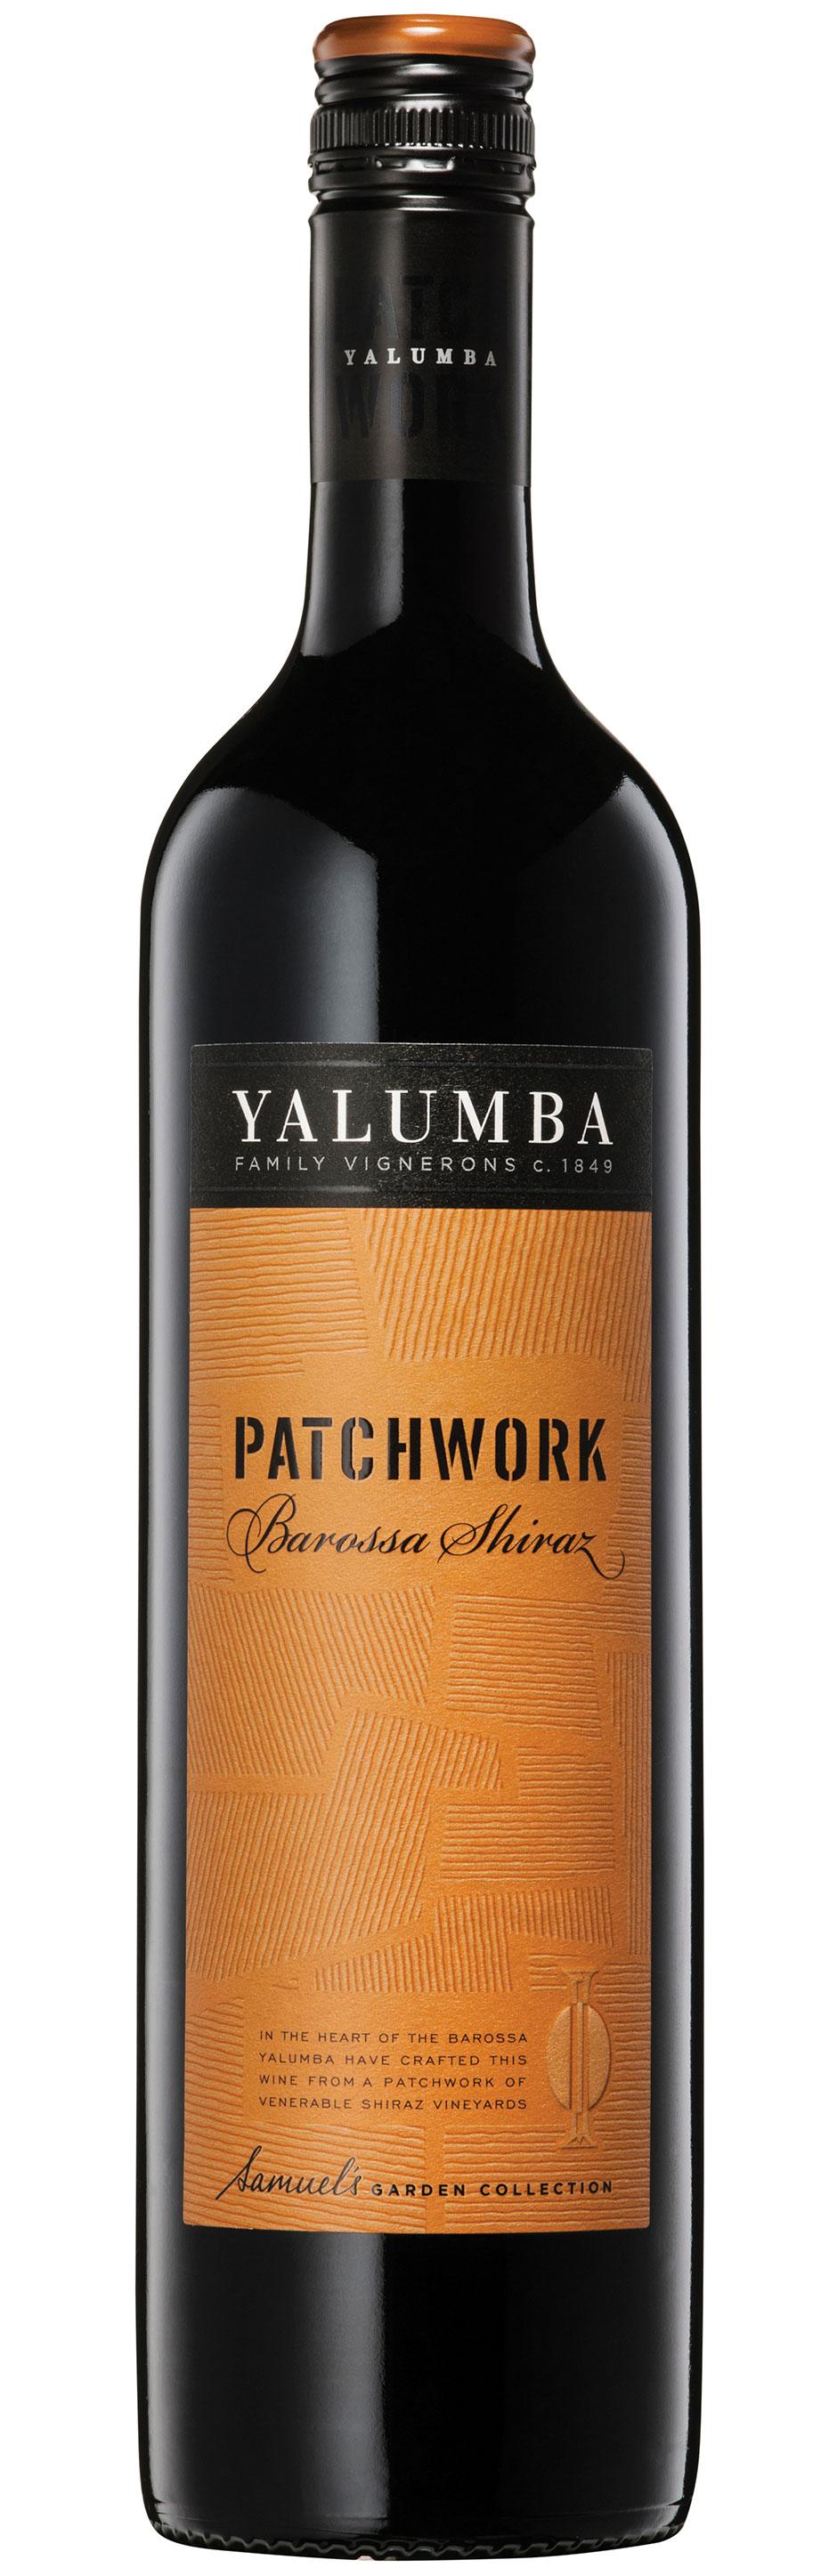 https://vinocorpperu.com/images/vinos/yalumba/patchwork_shiraz_2016.jpg